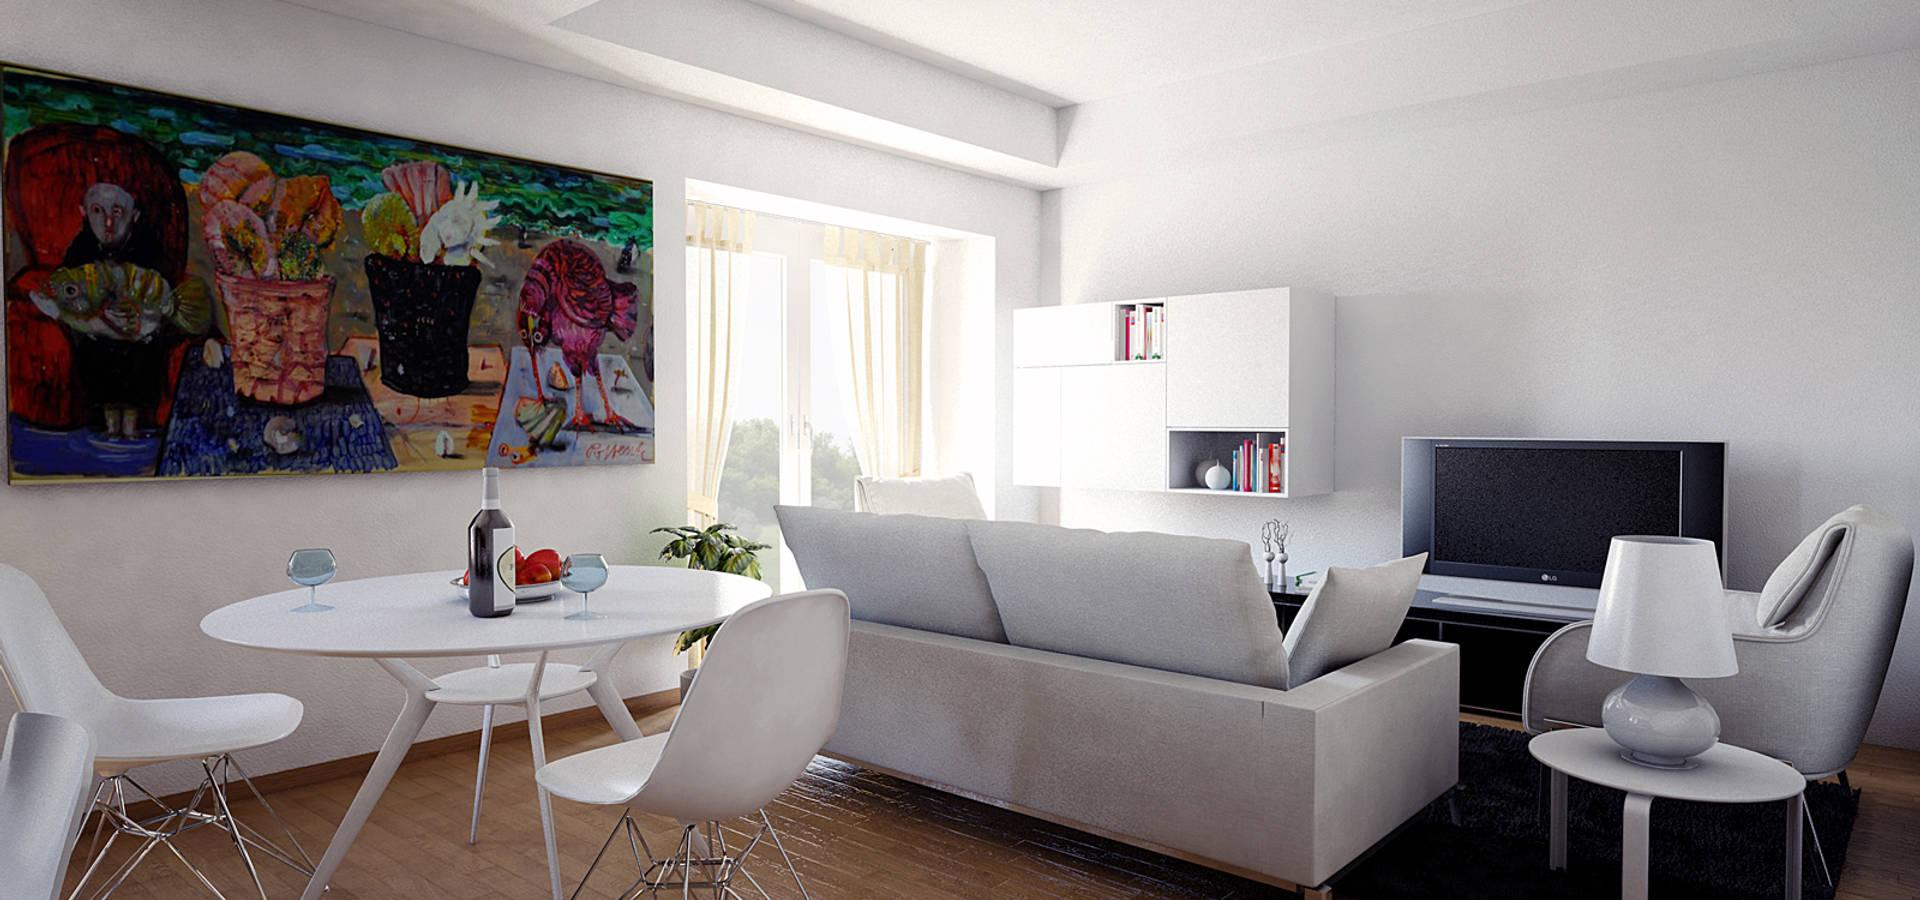 Studio Andrea Castagna